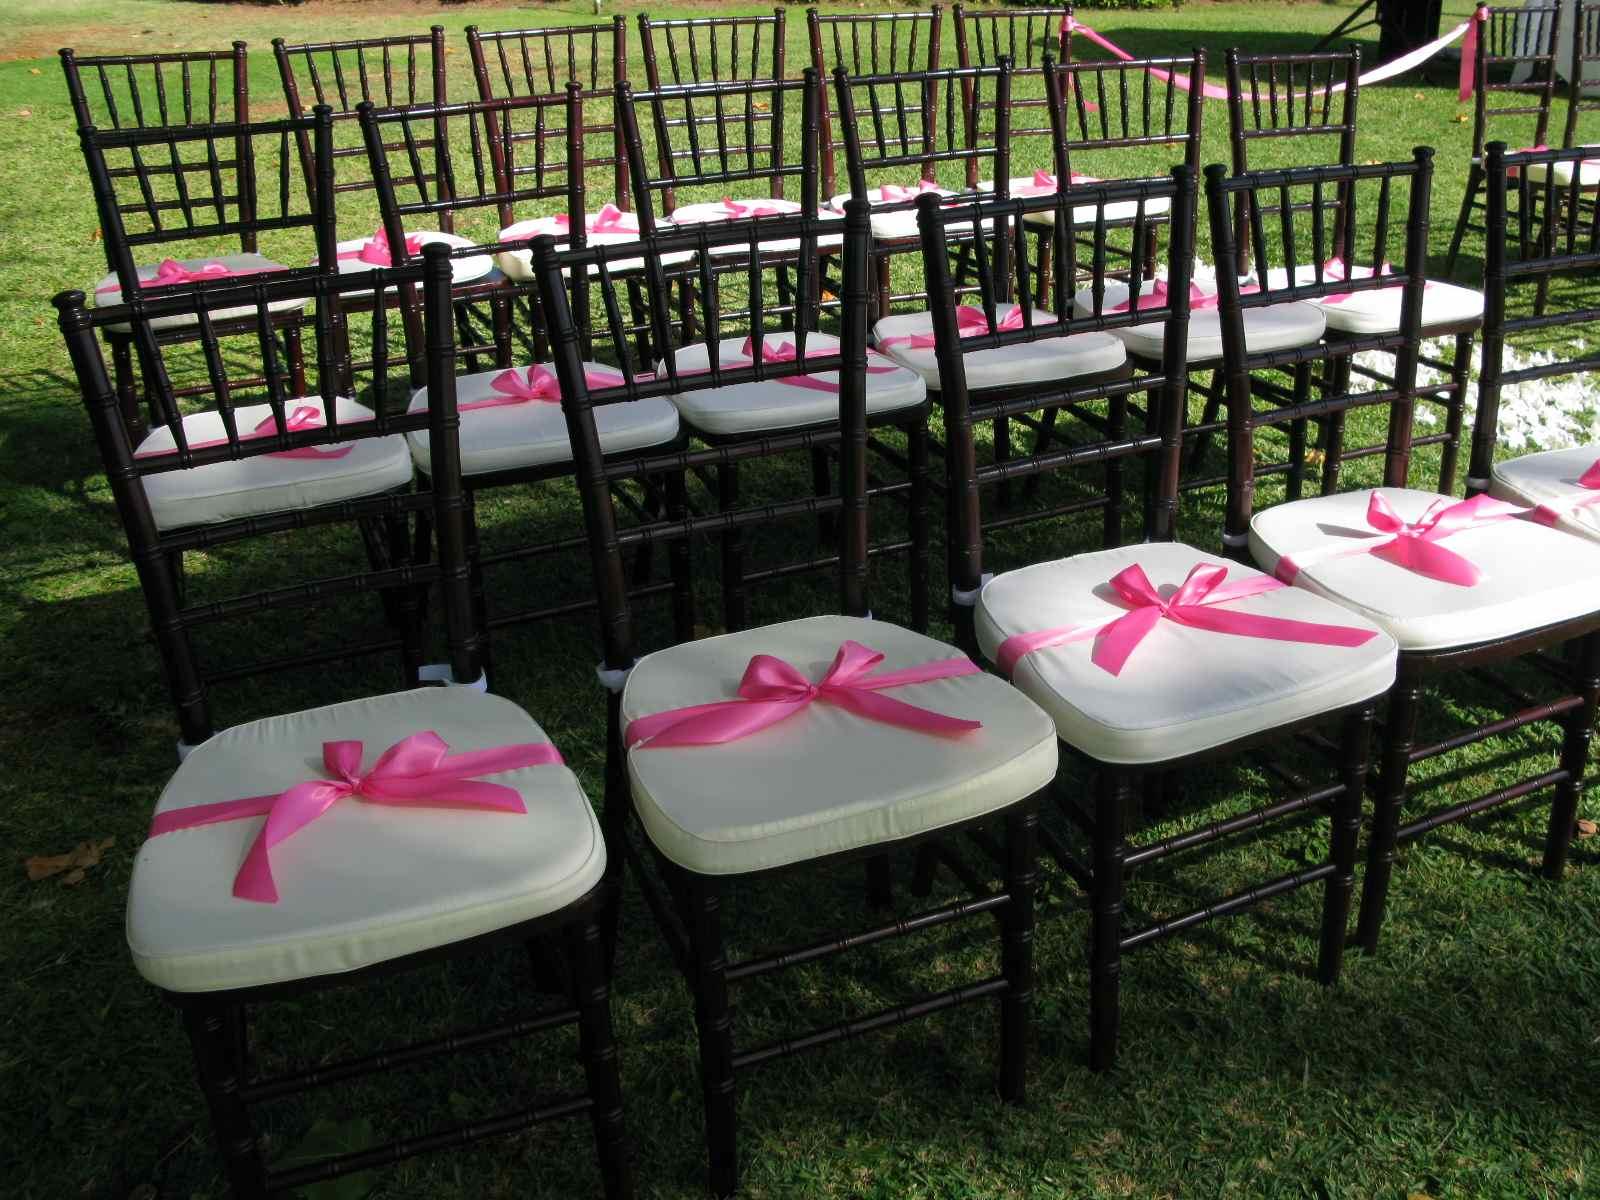 HARMONY OF LIFE Wedding Chair Accessories